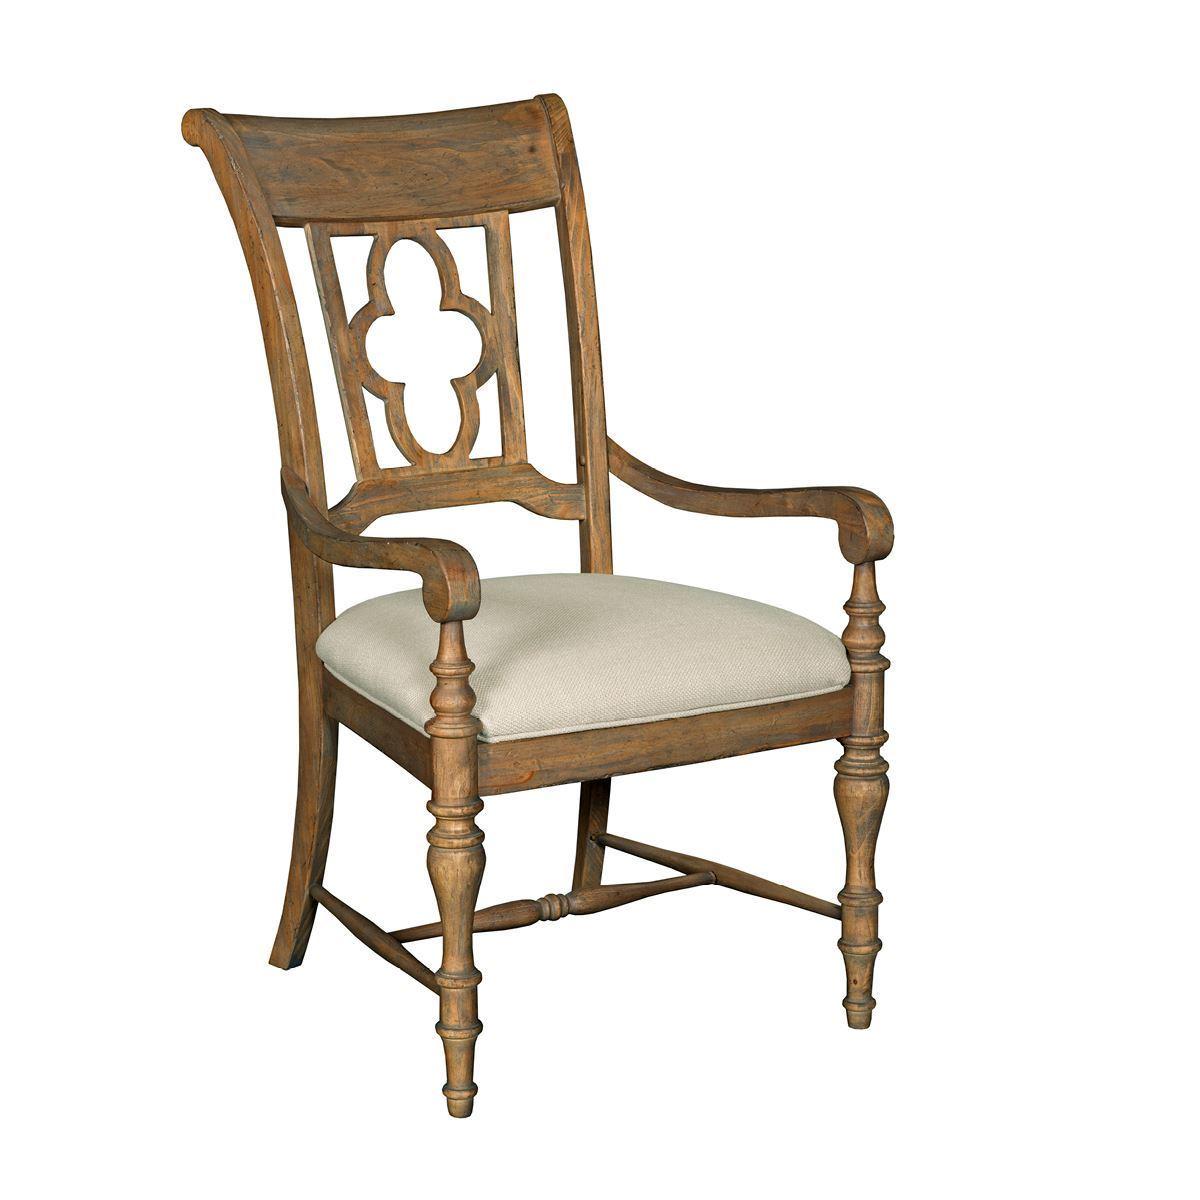 Bassett Furniture Milford Ct: Mackie Discount Furniture. Weatherford Arm Chair